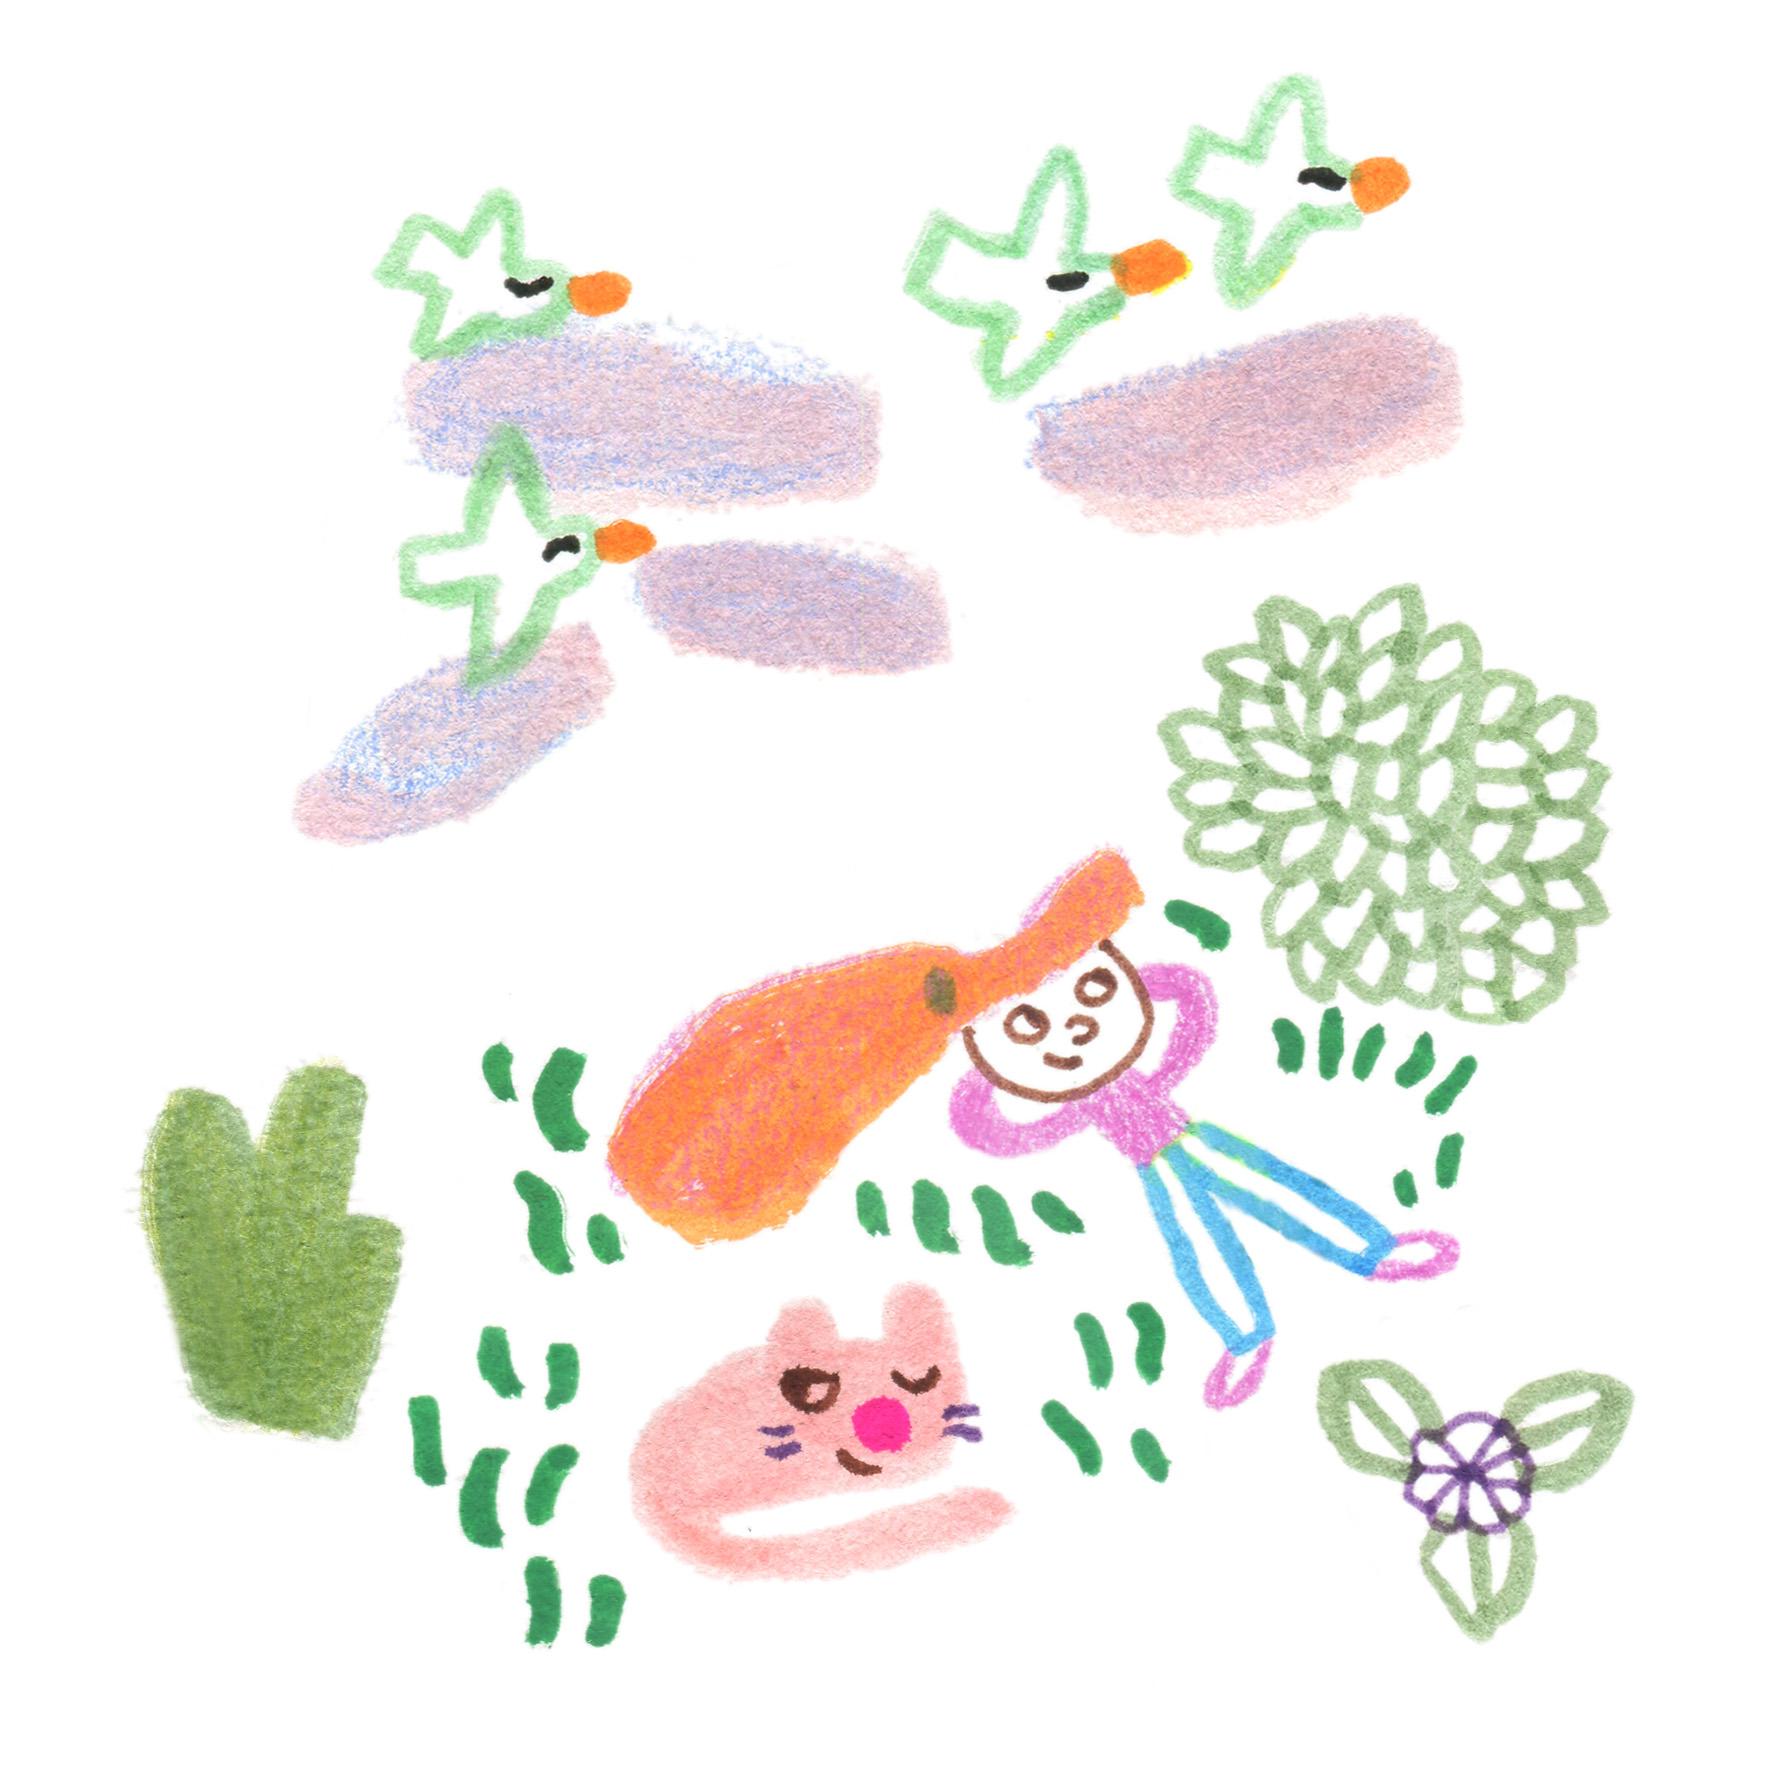 Fille dans un jardin